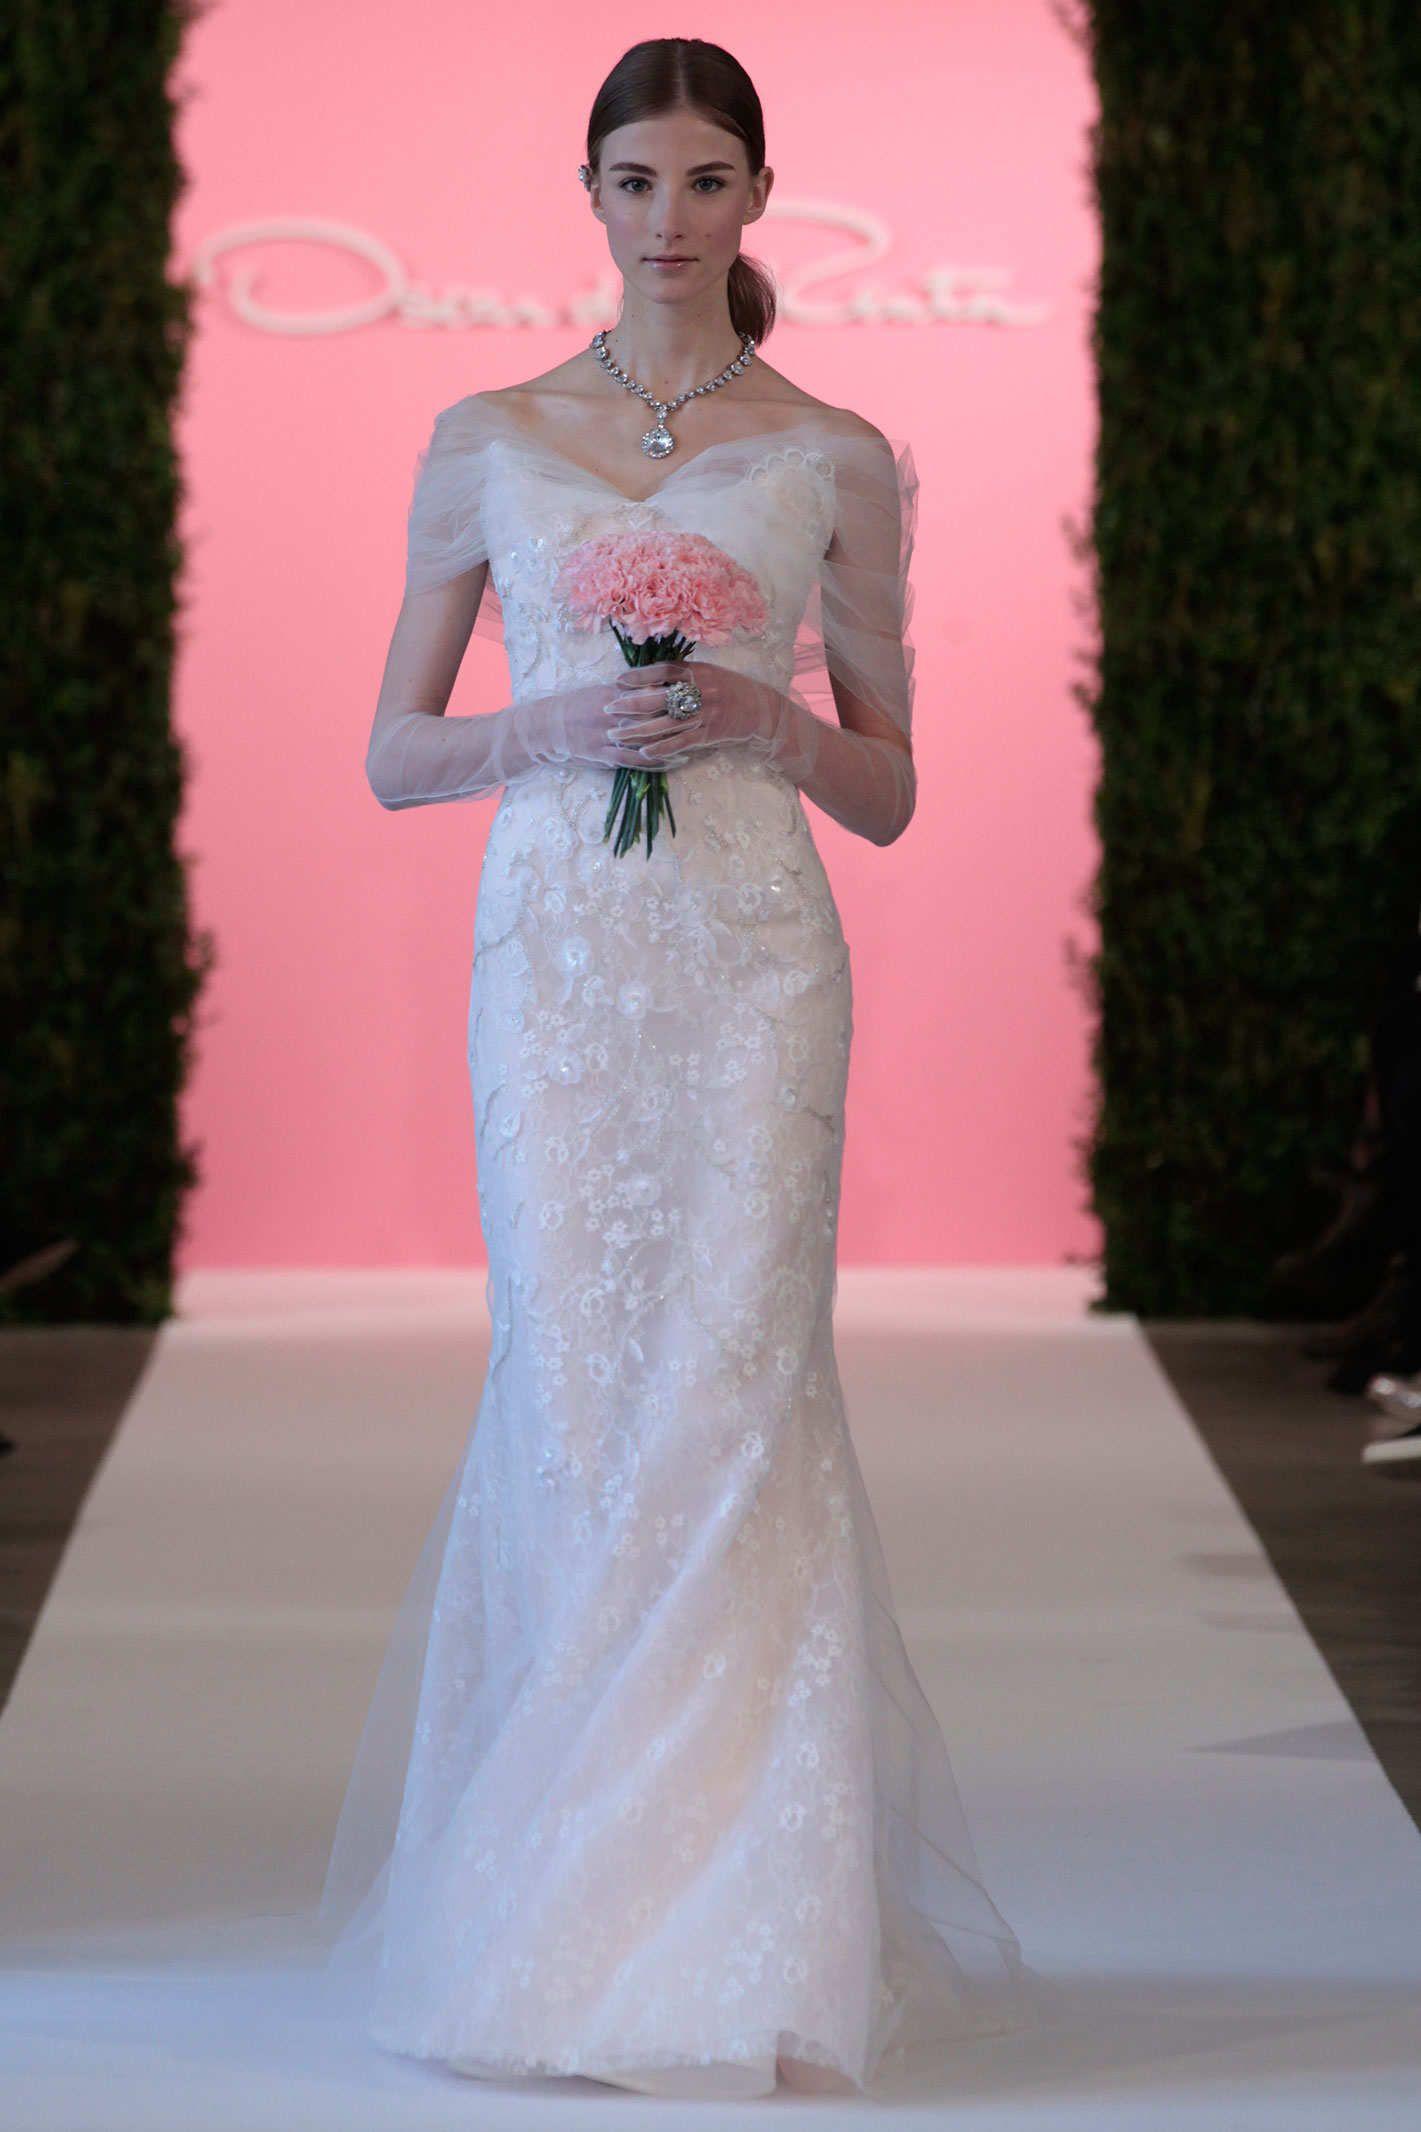 Oscar de la Renta Designer Profile | Wedding Gowns | Pinterest ...